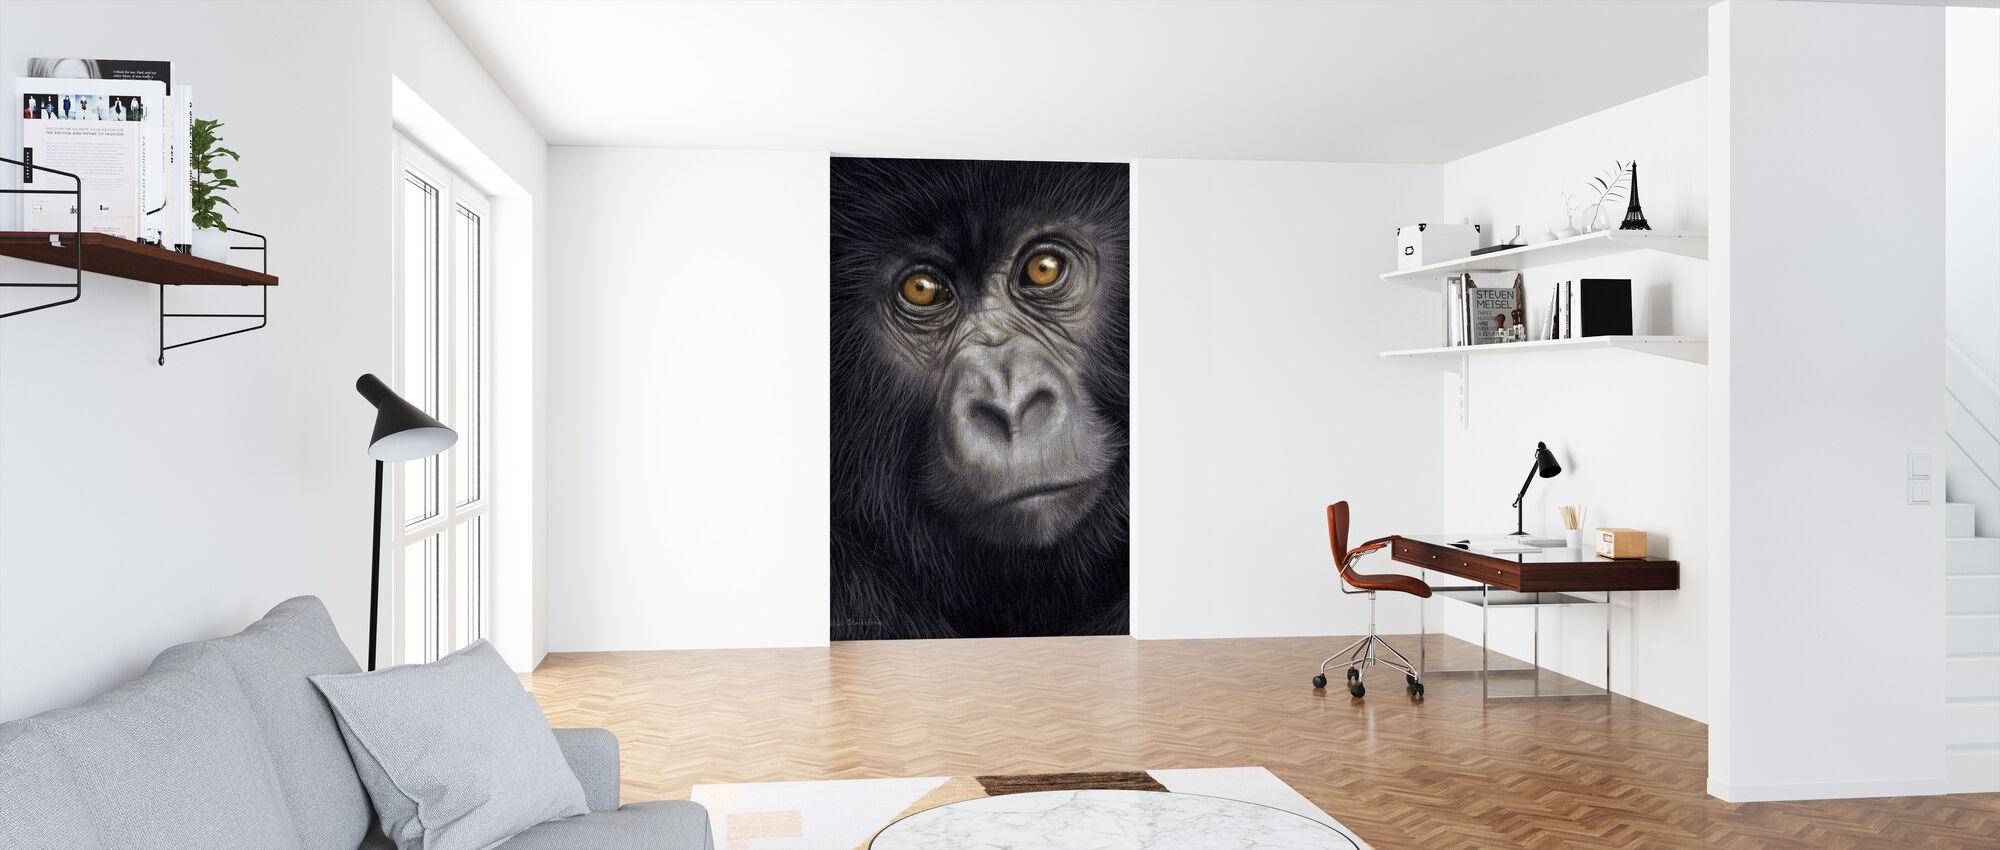 Young Mountain Gorilla - Wallpaper - Office